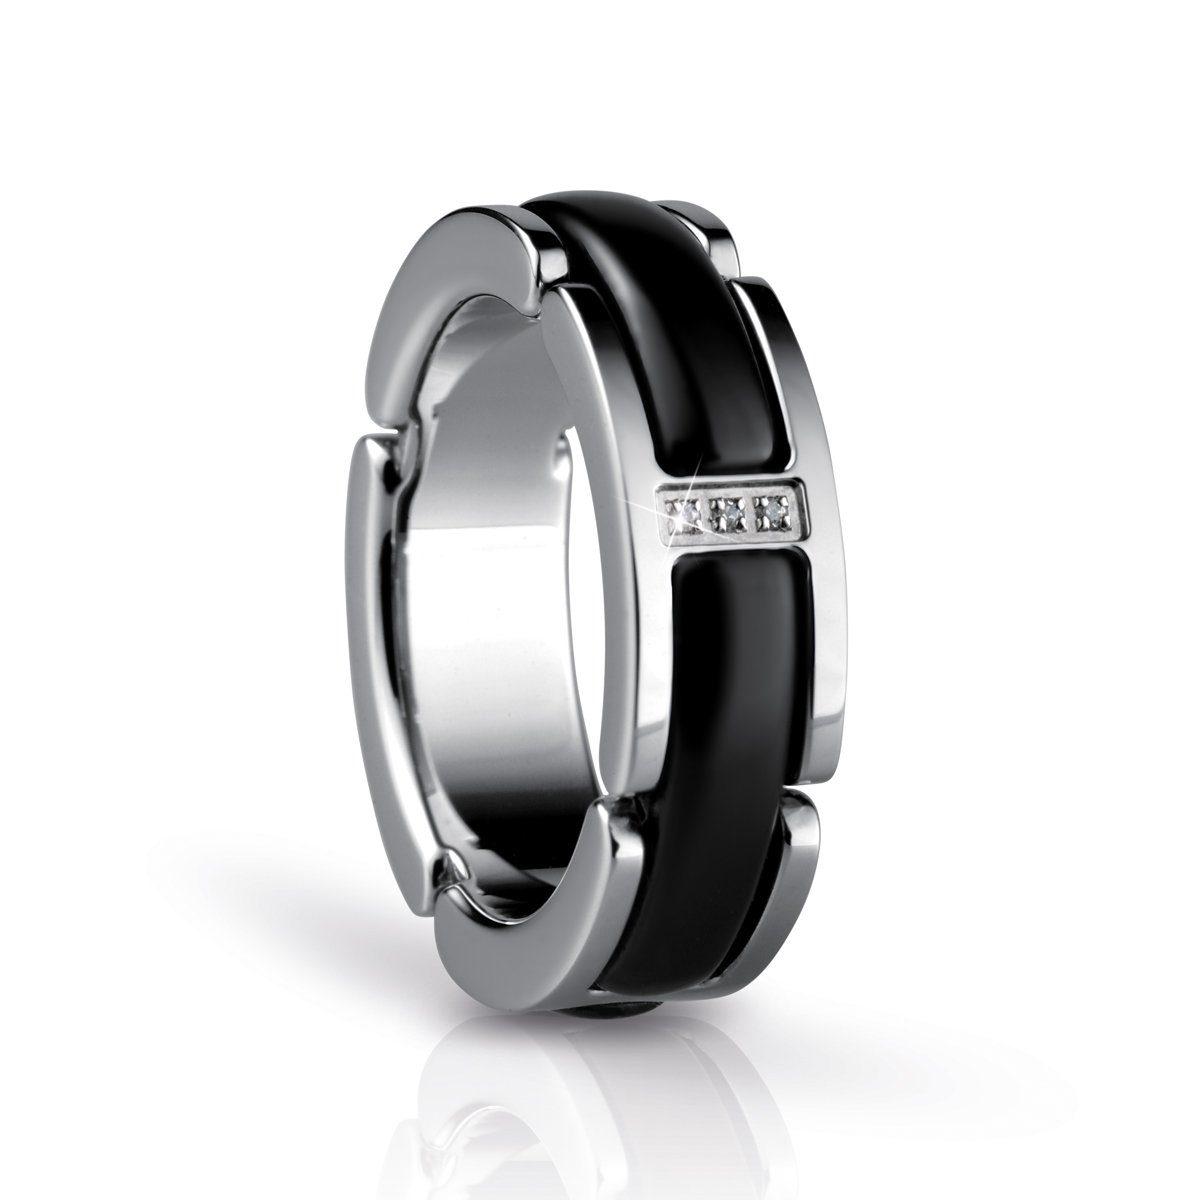 Bering Bering Time Ring silber-schwarz 55mm